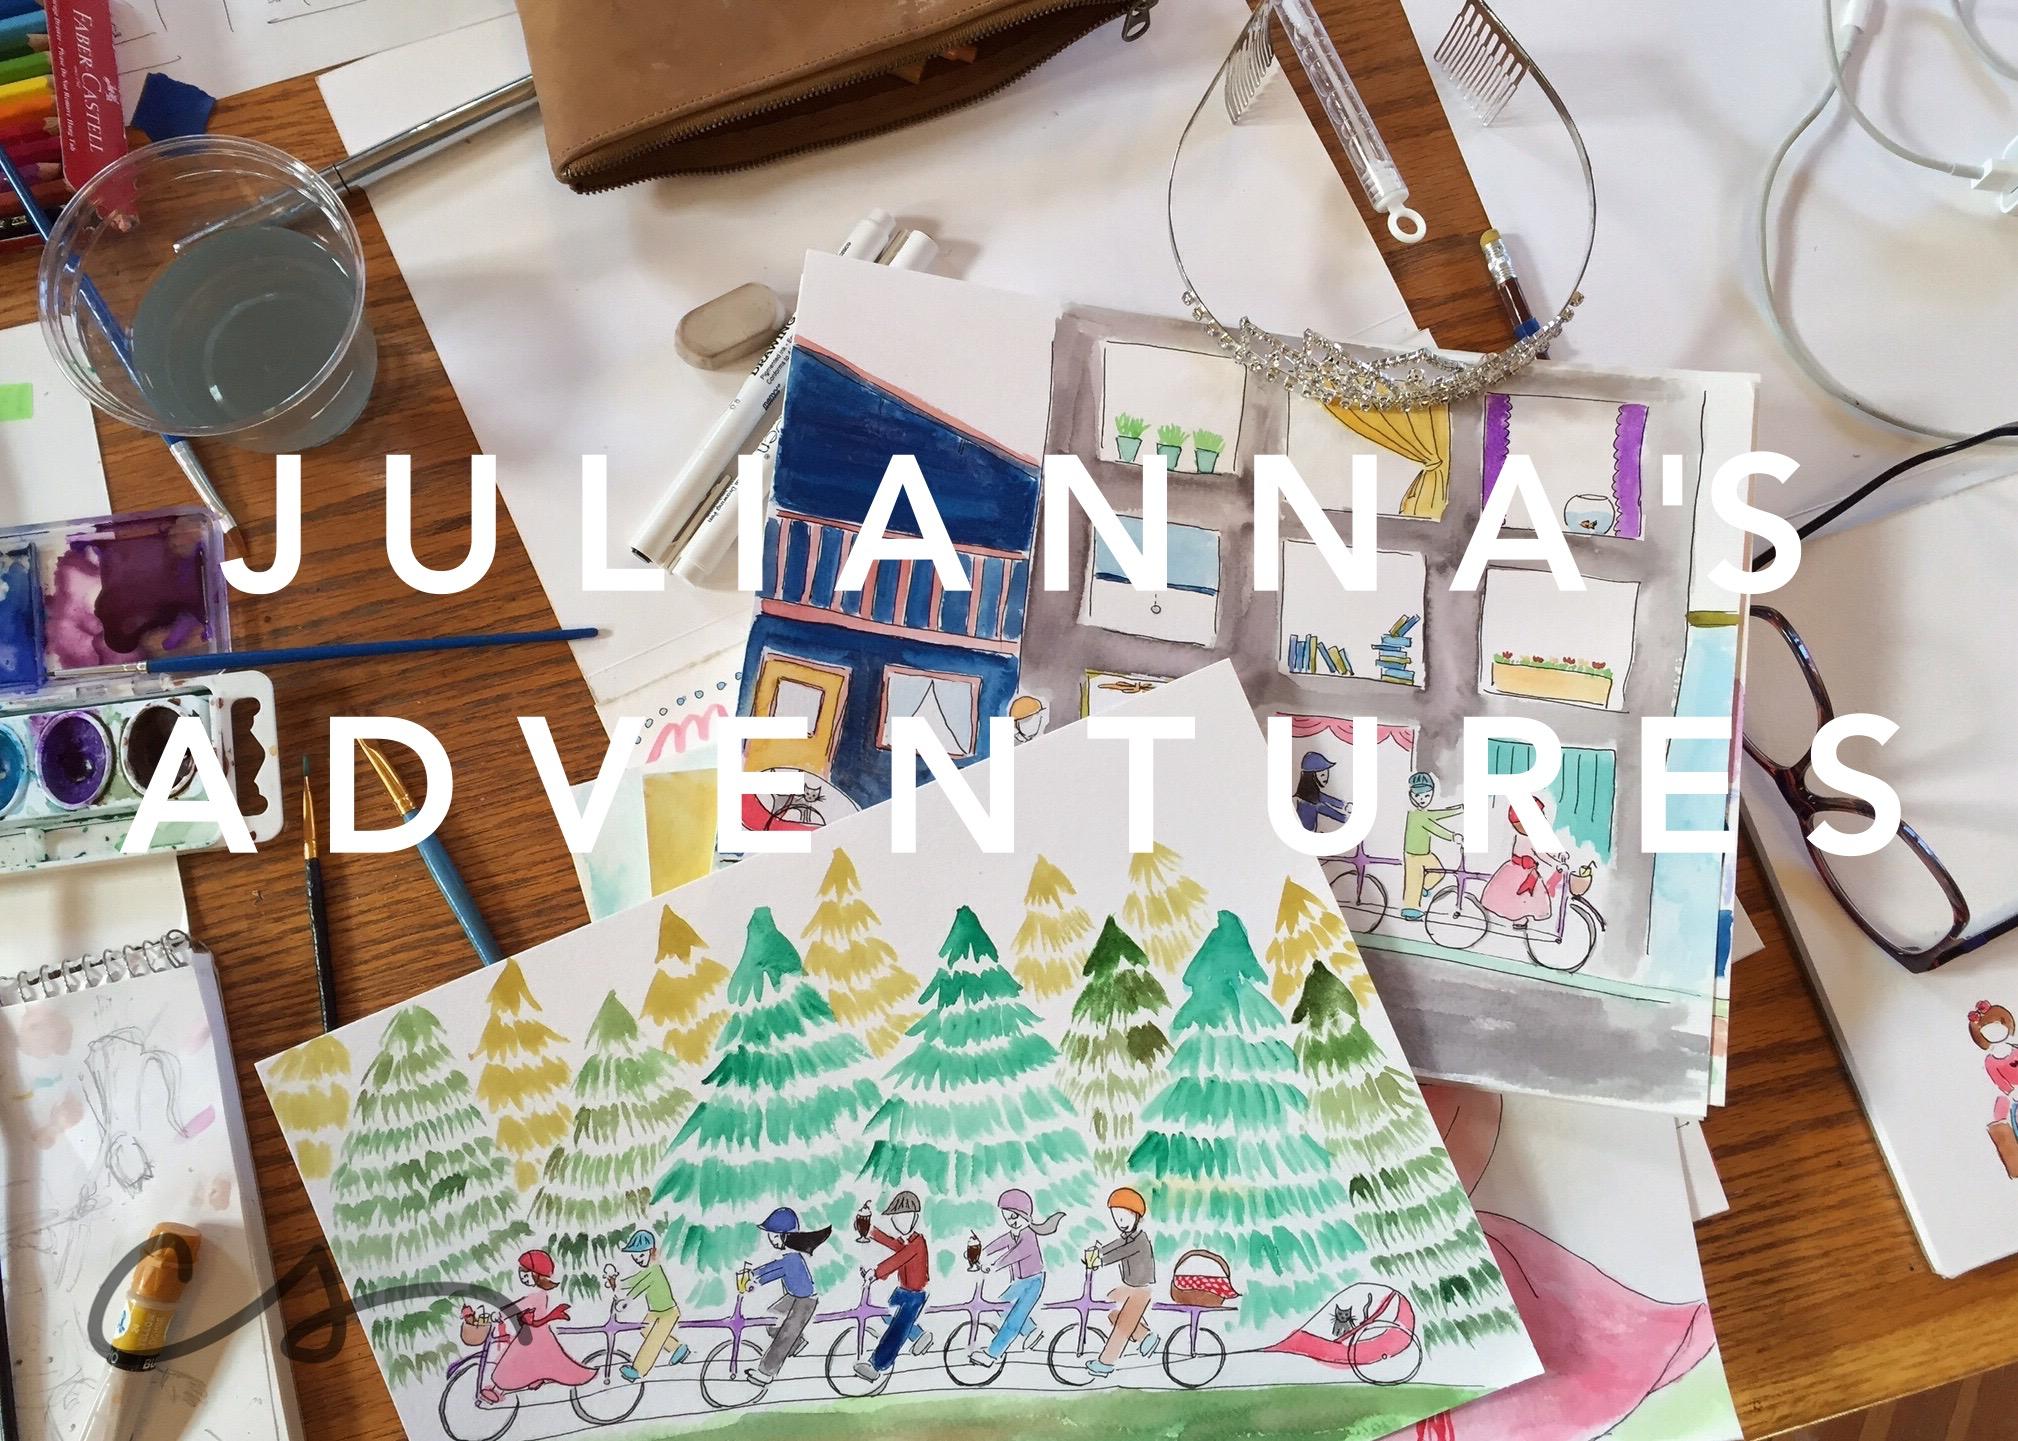 Julianna's Adventures - I